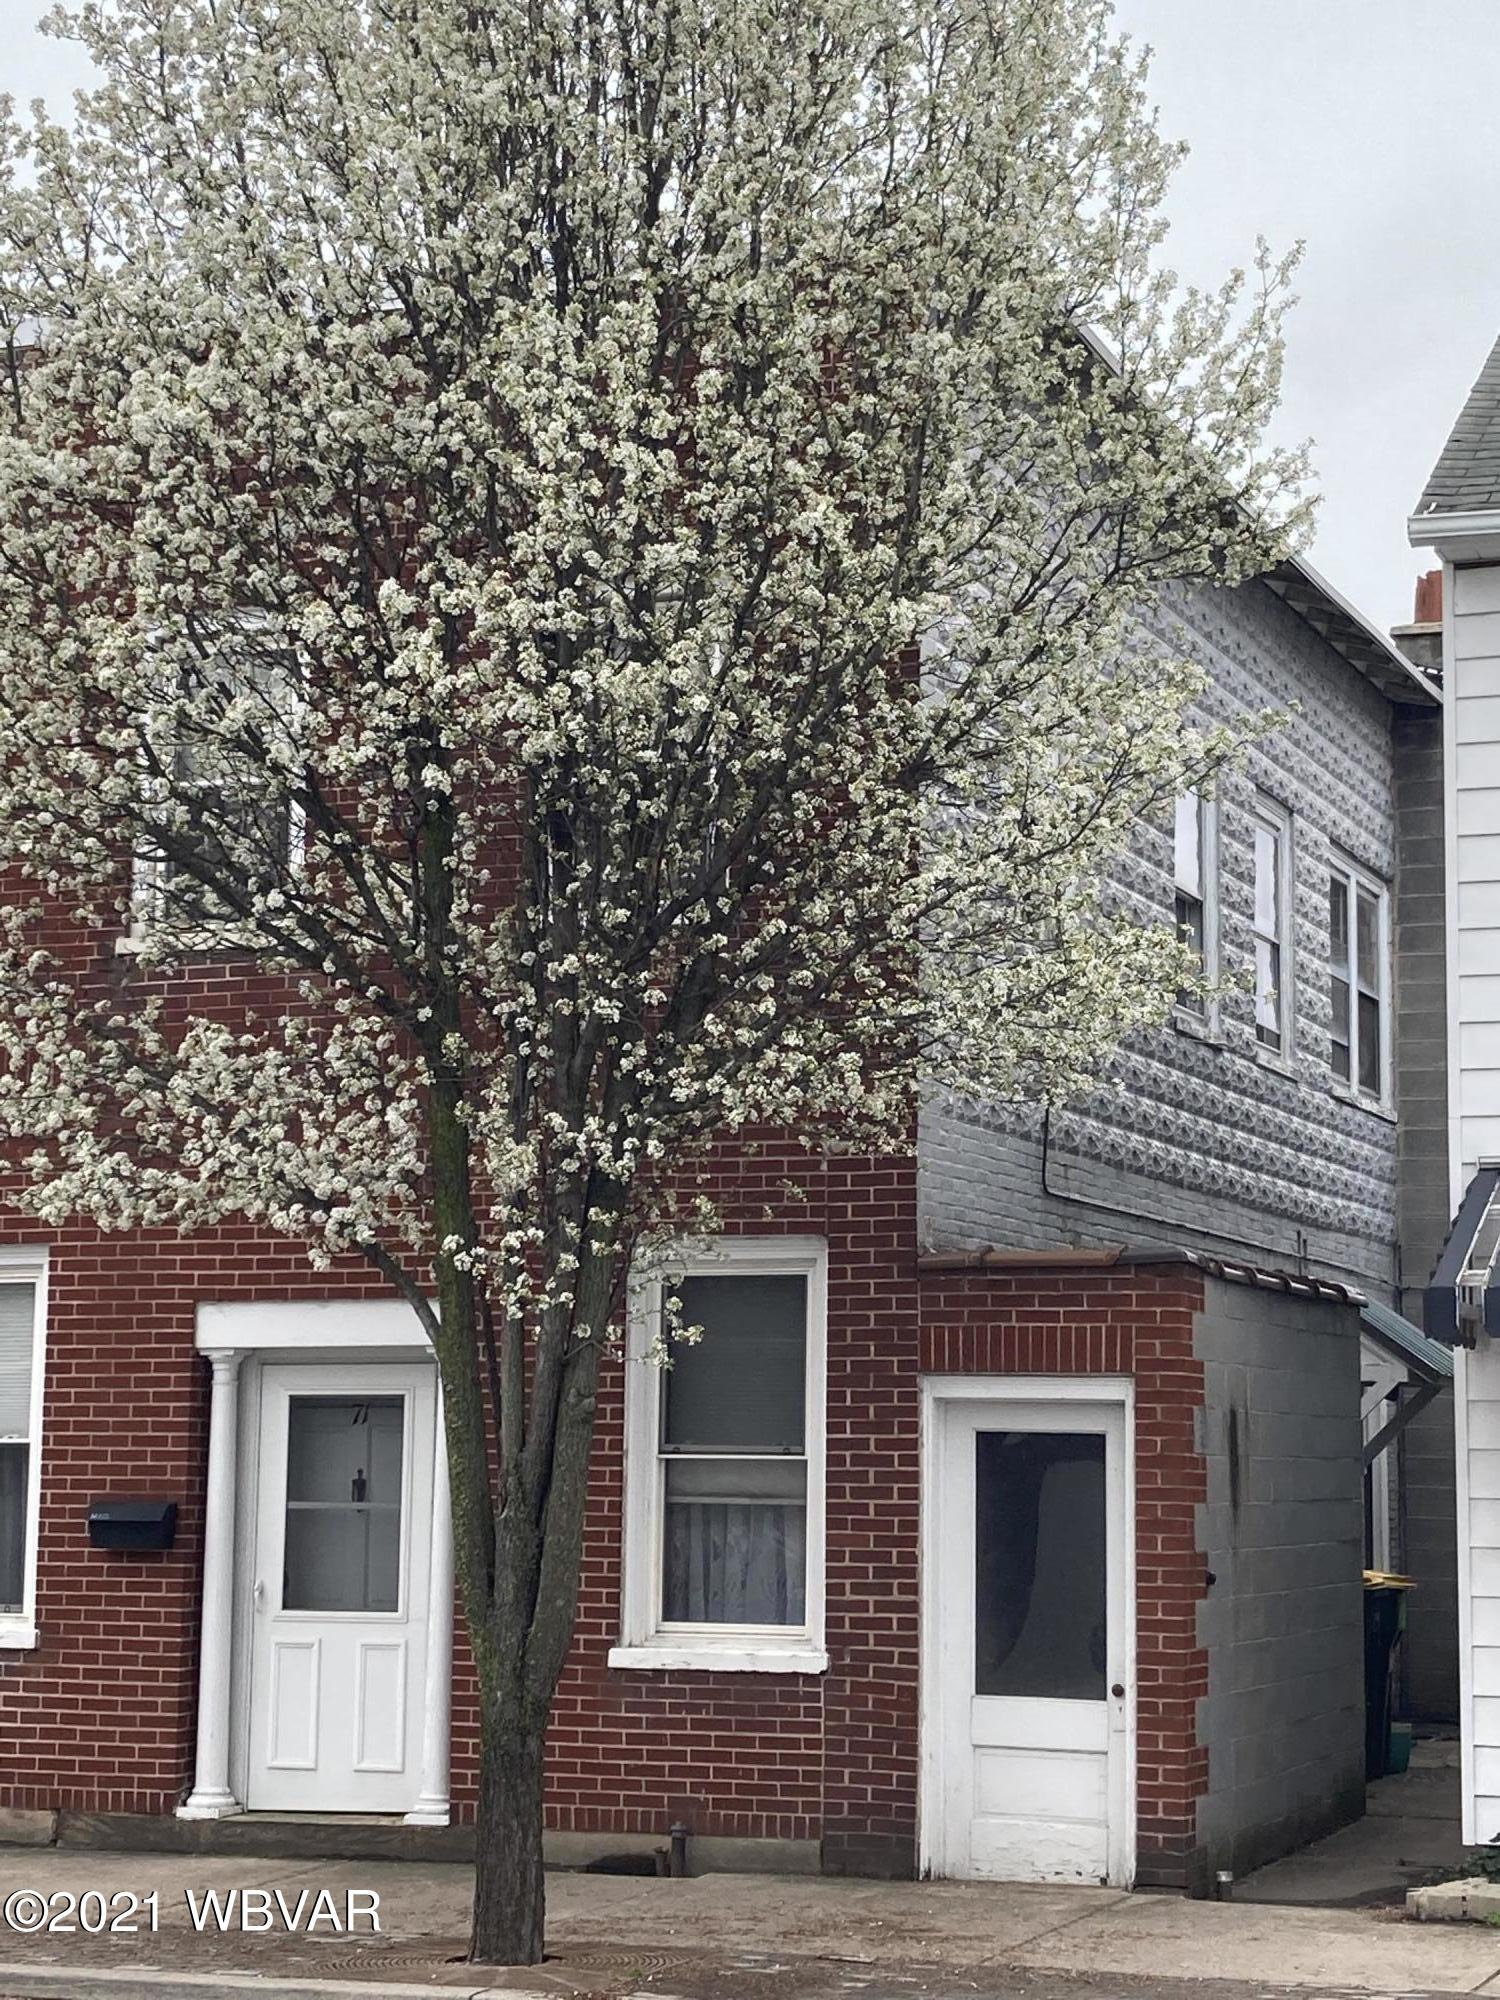 65-71 MAIN STREET, Hughesville, PA 17737, ,Multi-units,For sale,MAIN,WB-92286